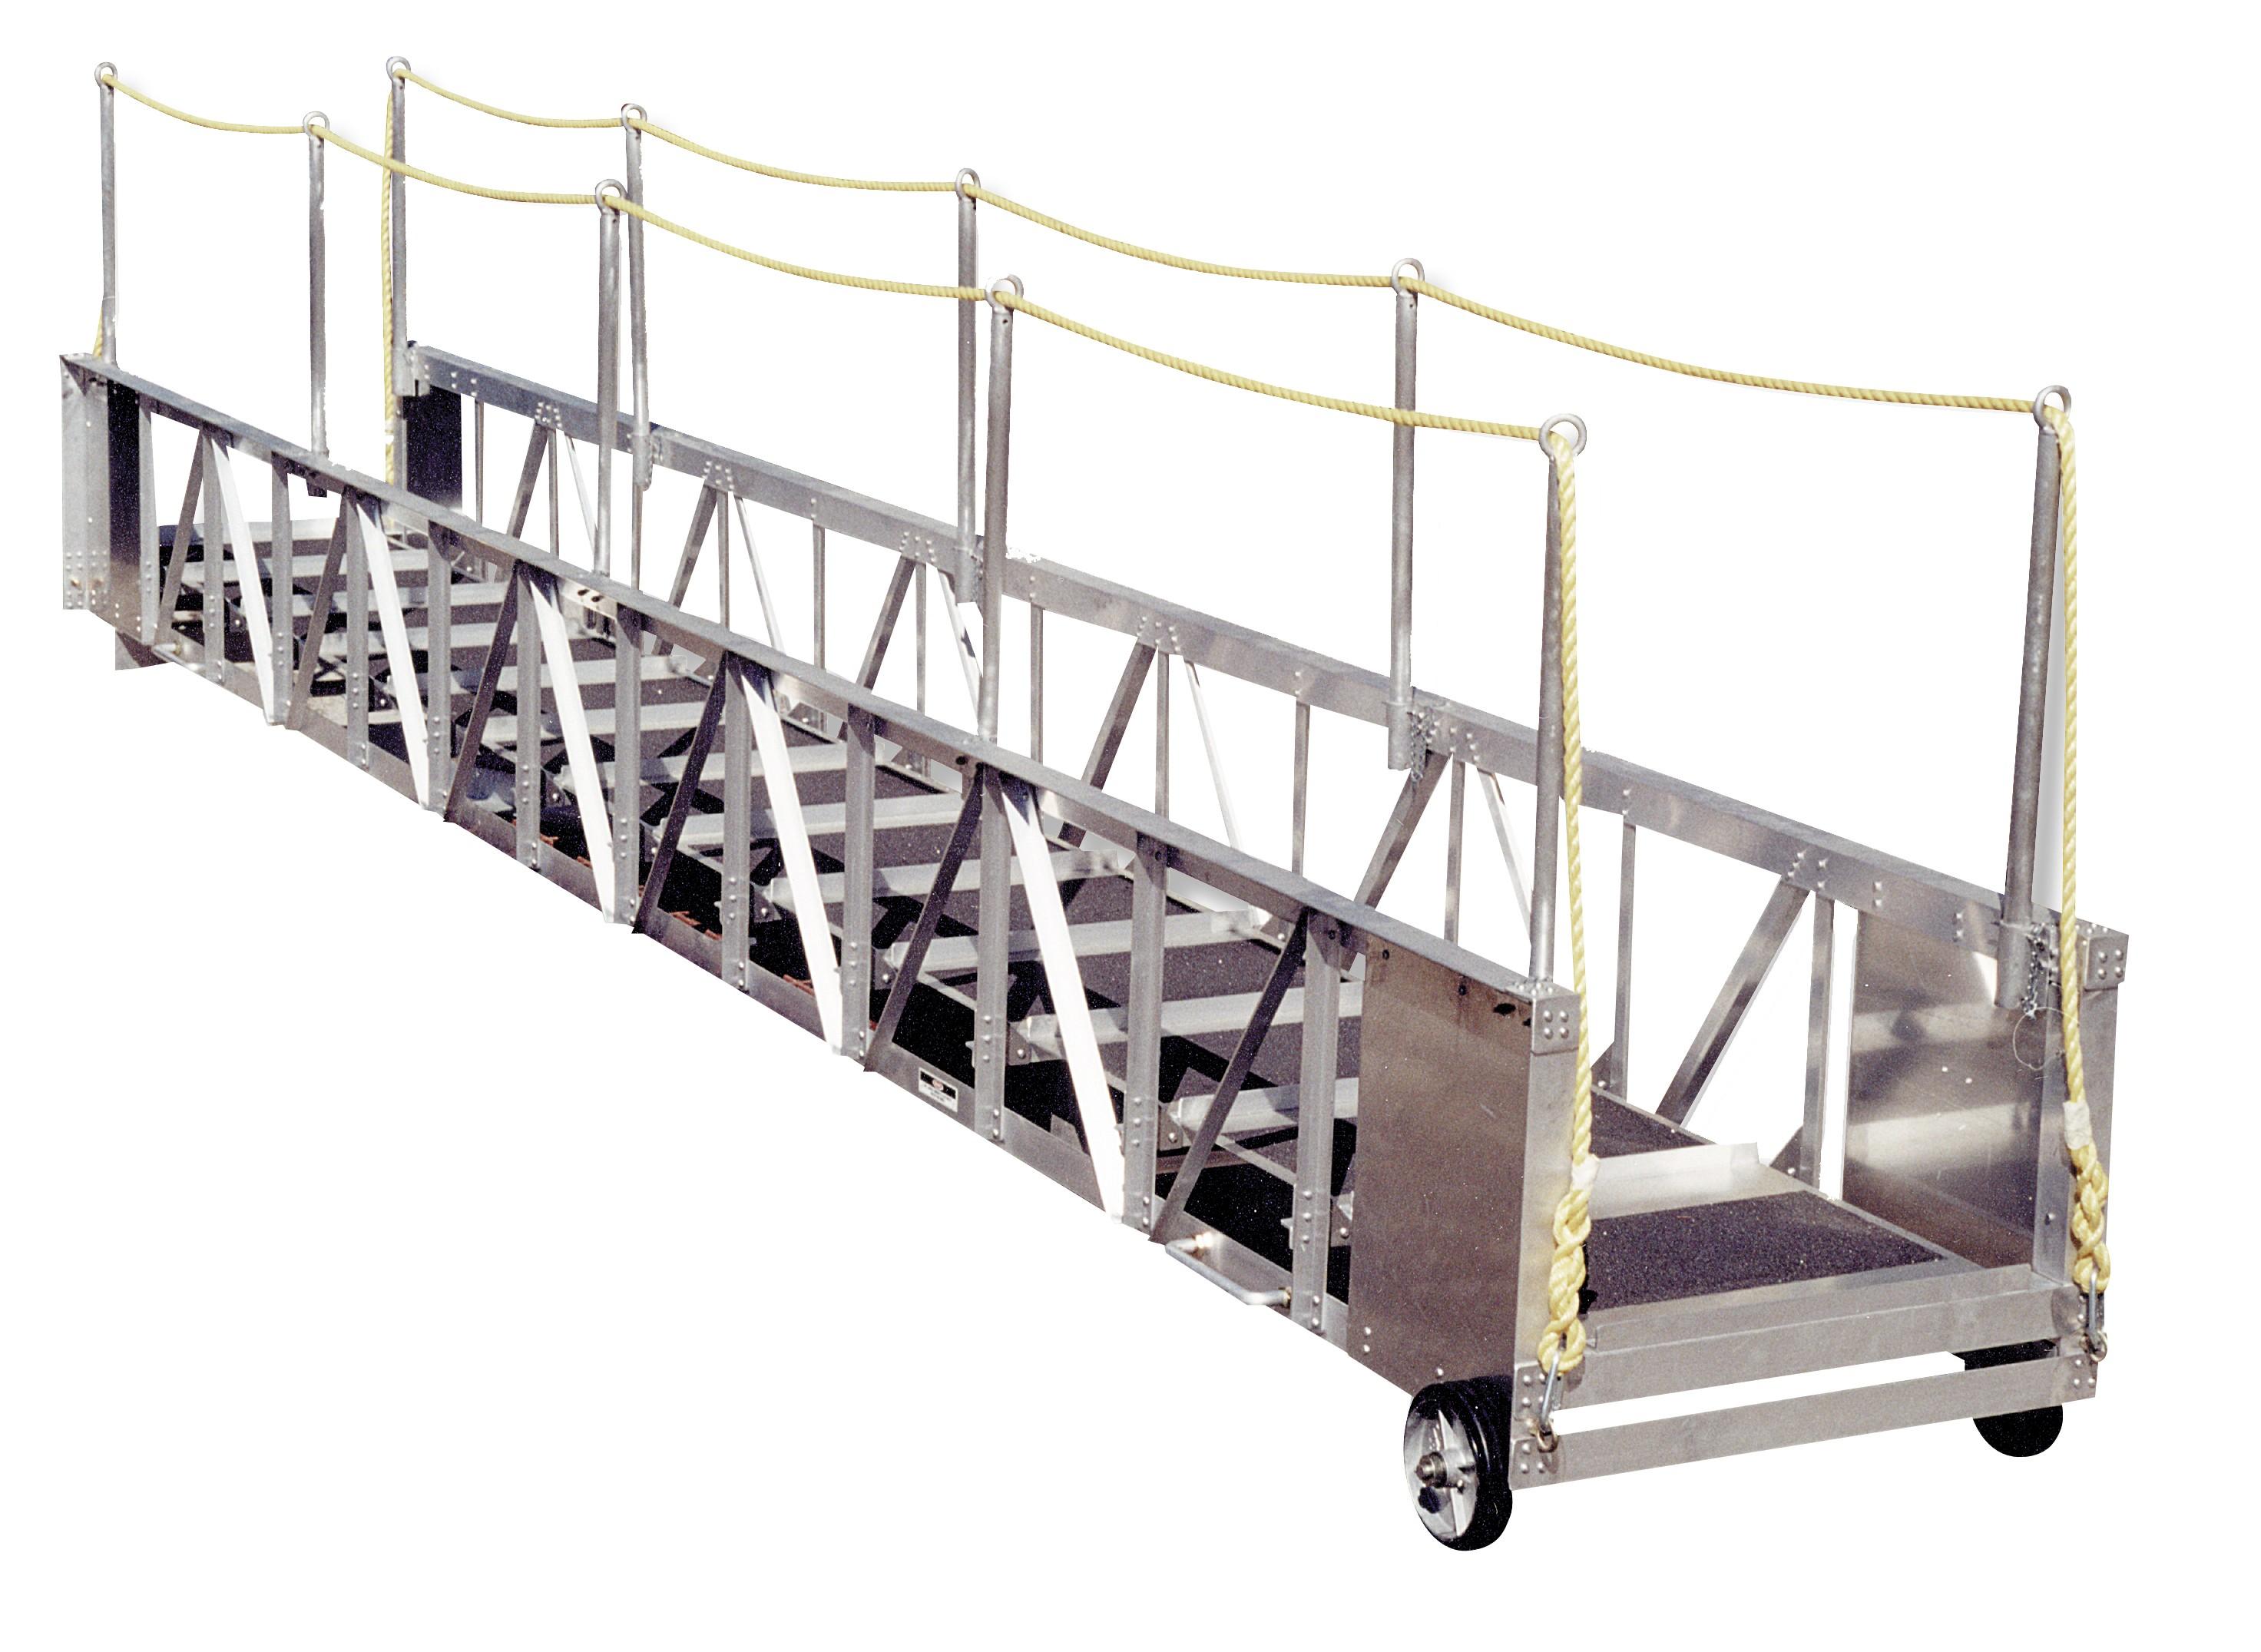 Calico Ladders Gw 500 20 Ct Aluminum Straight Truss Gangway